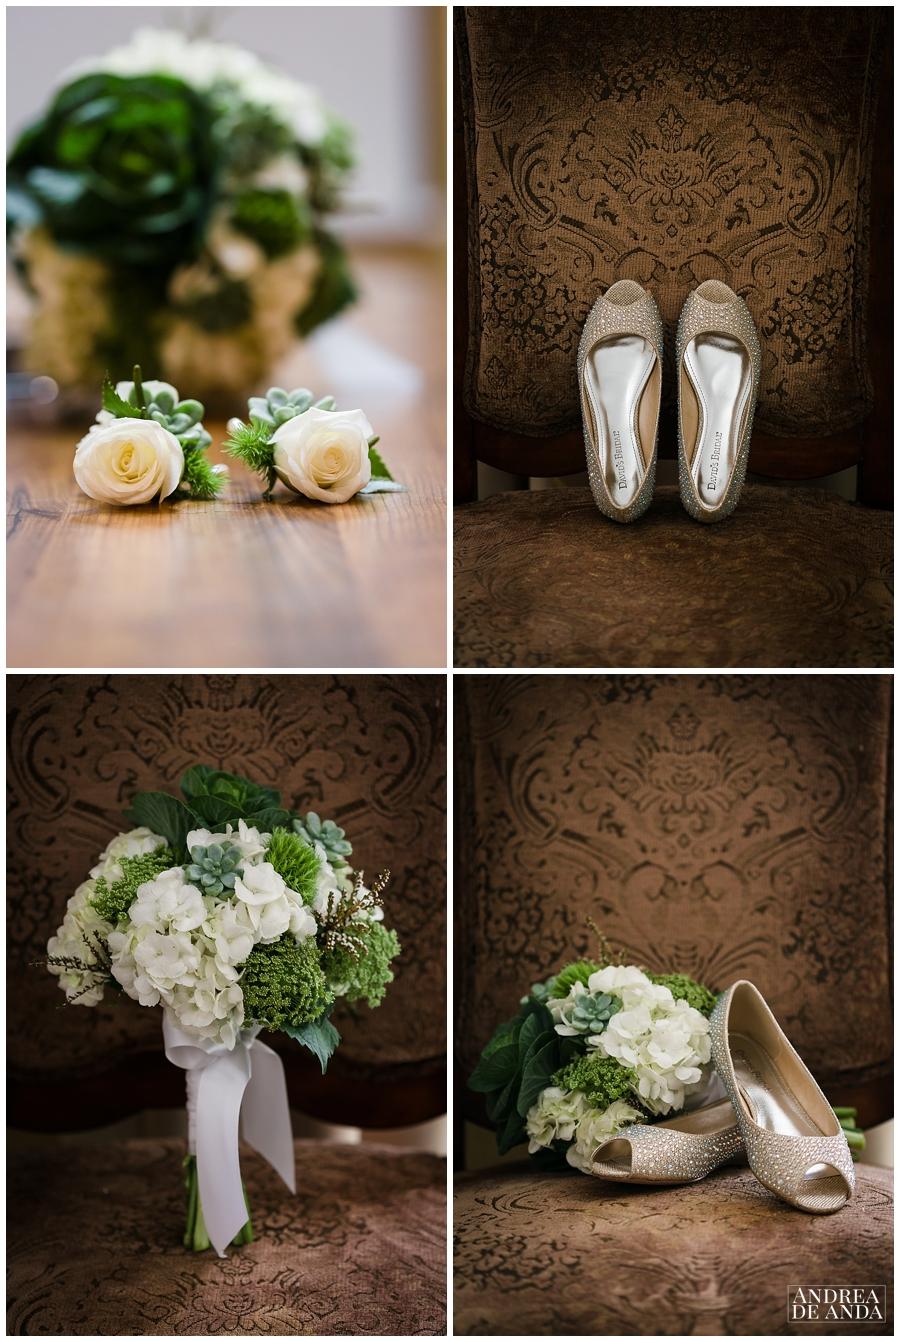 Radisson_Central Coast Wedding Photography-8.jpg